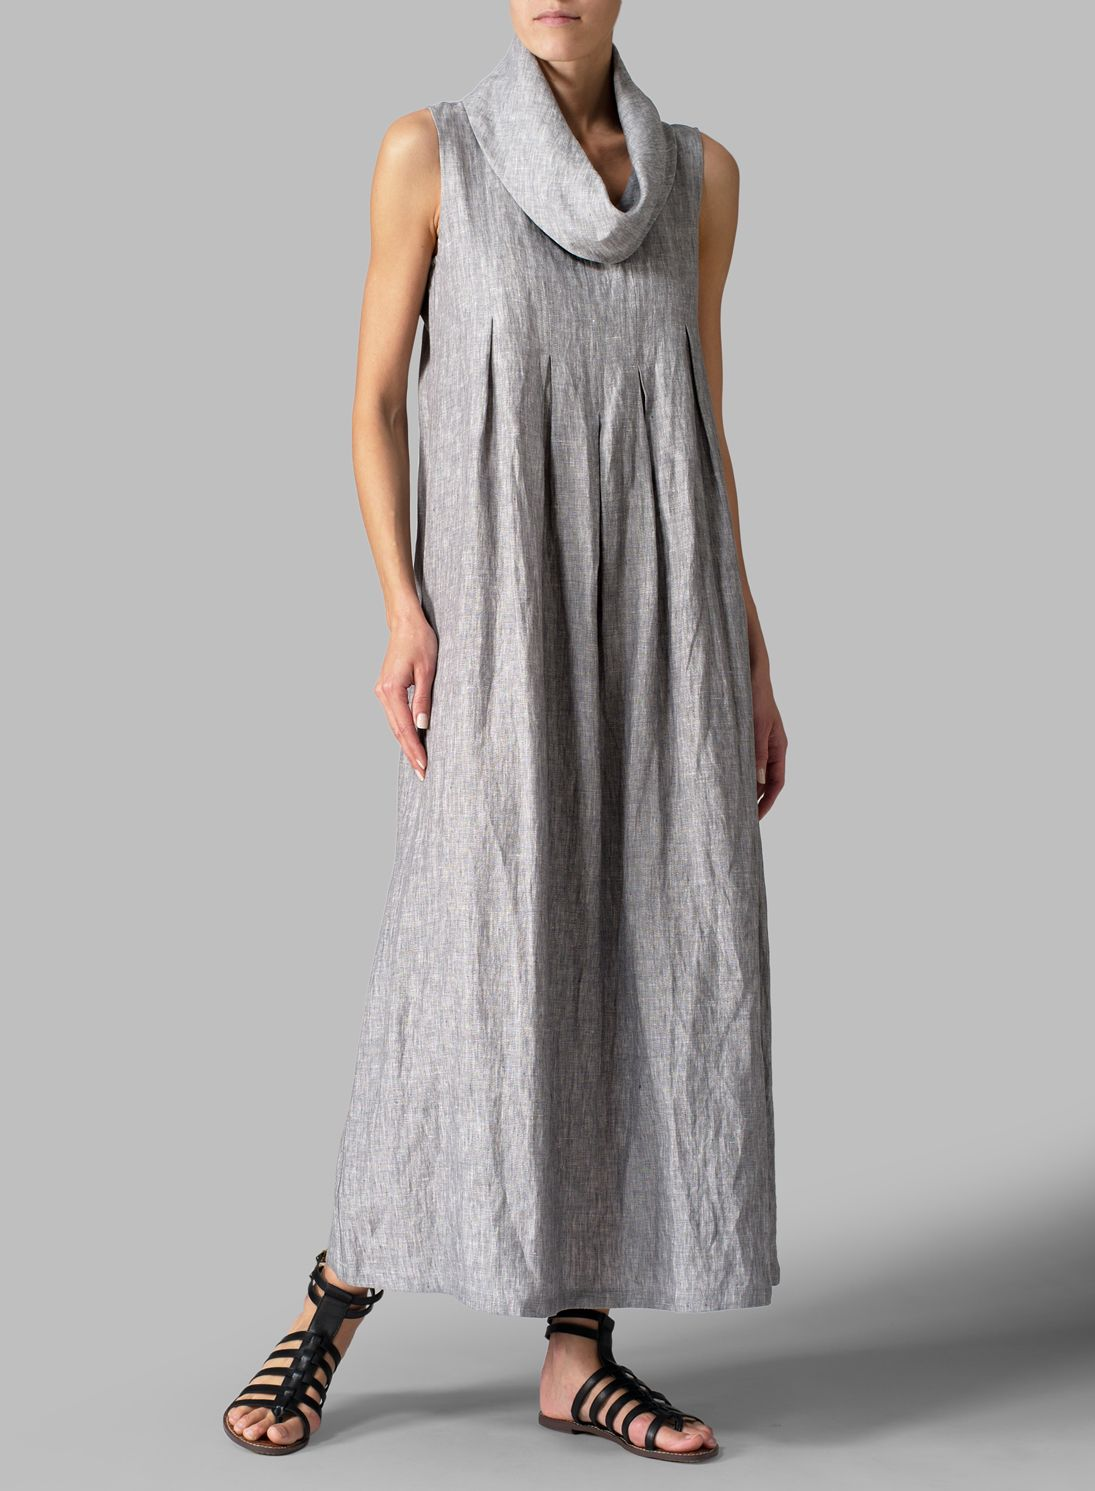 6e65bd58ec8 Linen Sleeveless Cowl Neck Long Dress with gladiators